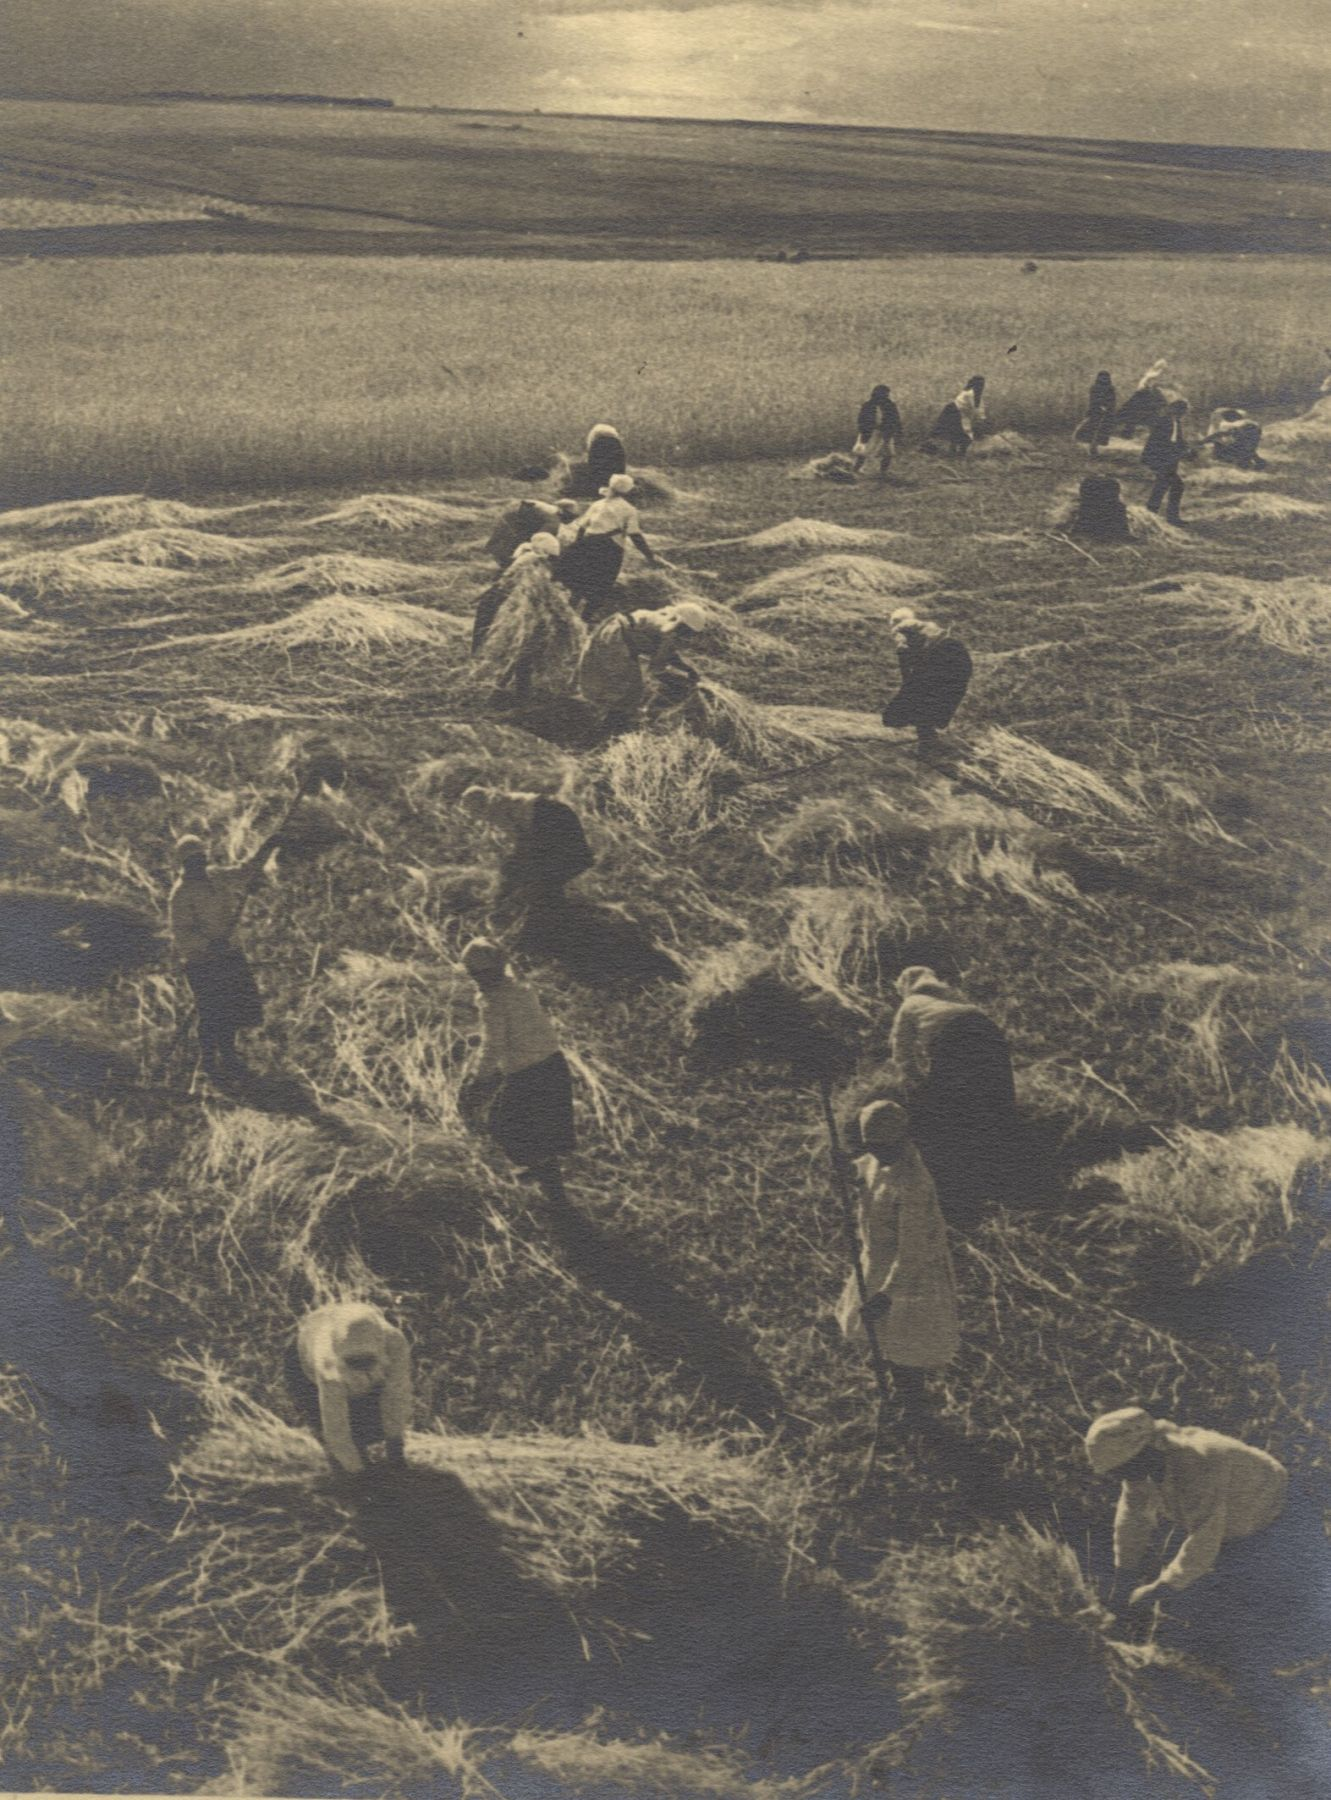 Georgy Petrusov (1903-1971)  Harvest, 1934  Vintage gelatin silver print